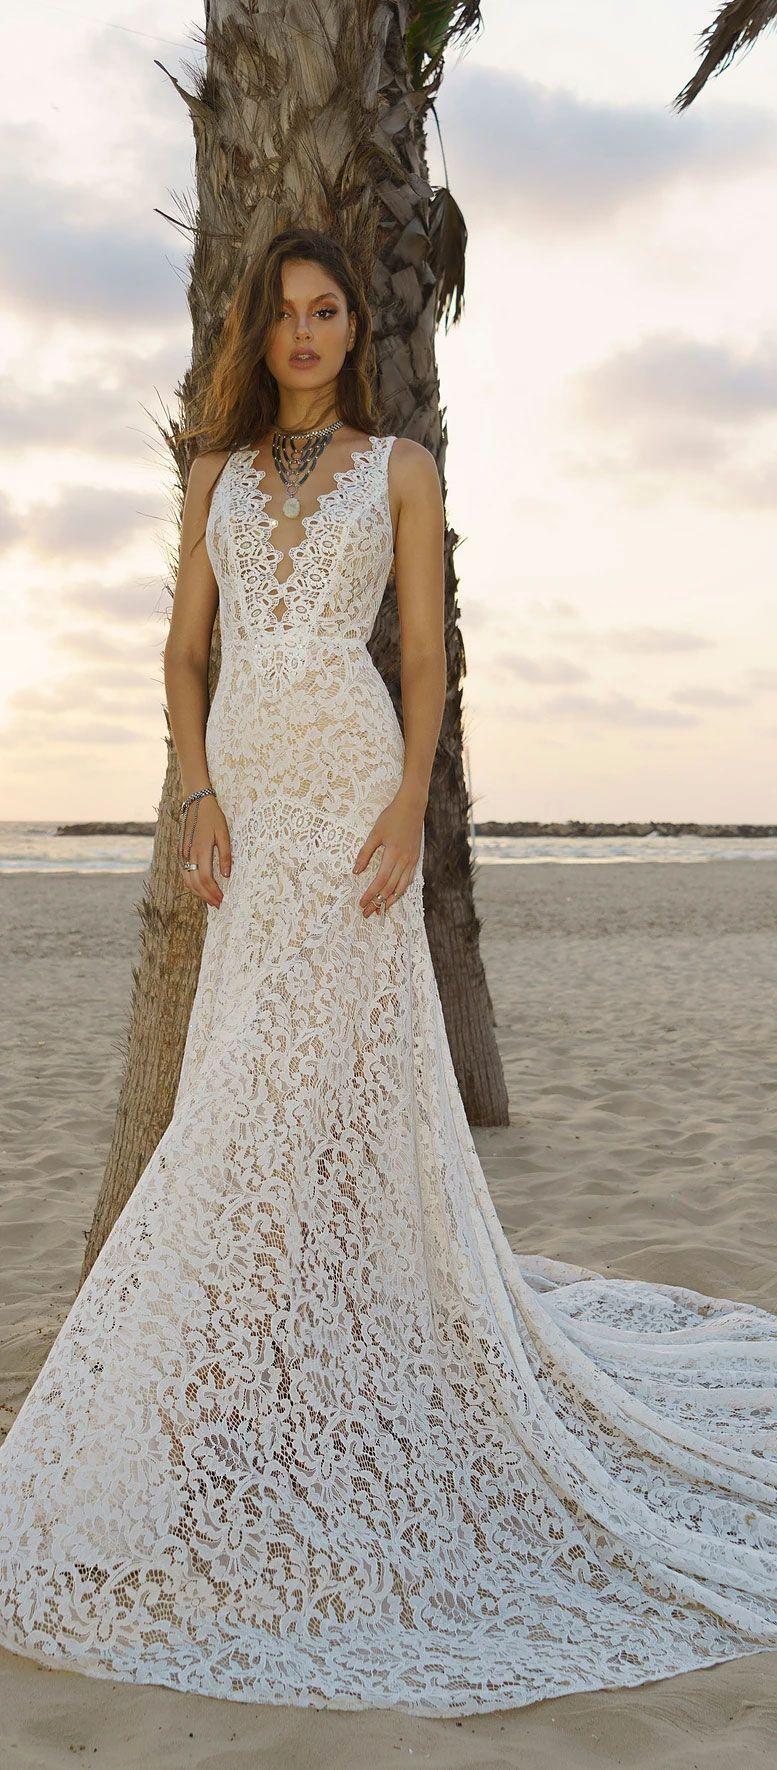 Rish bridal wedding dresses u sun dance boho chic bridal